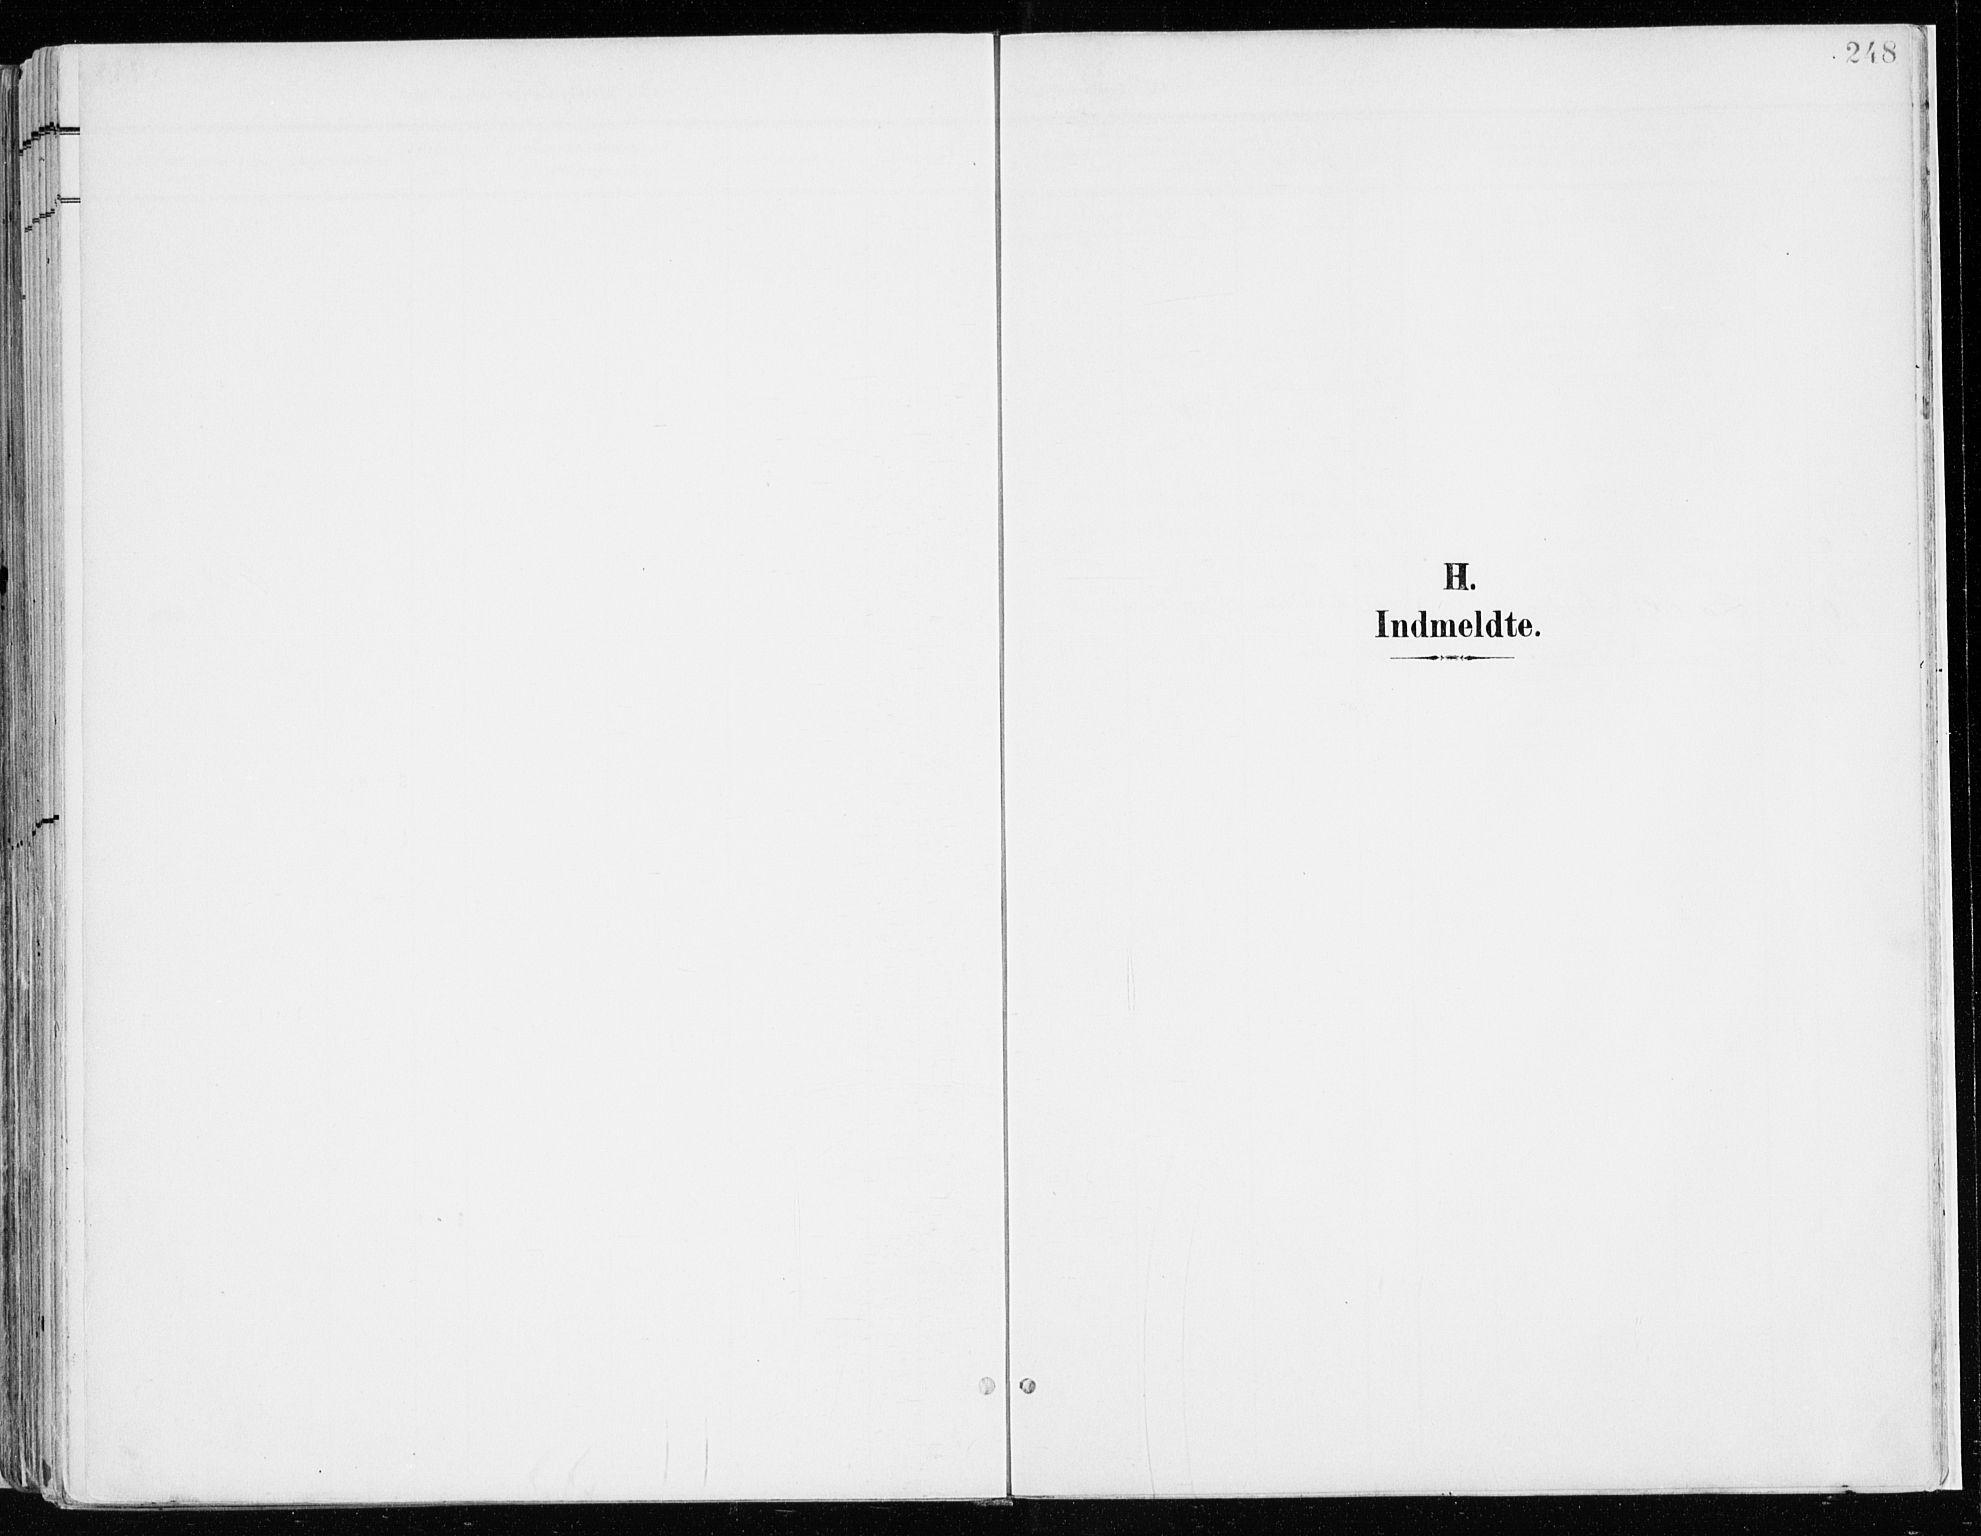 SAH, Nord-Odal prestekontor, Parish register (official) no. 9, 1902-1926, p. 248